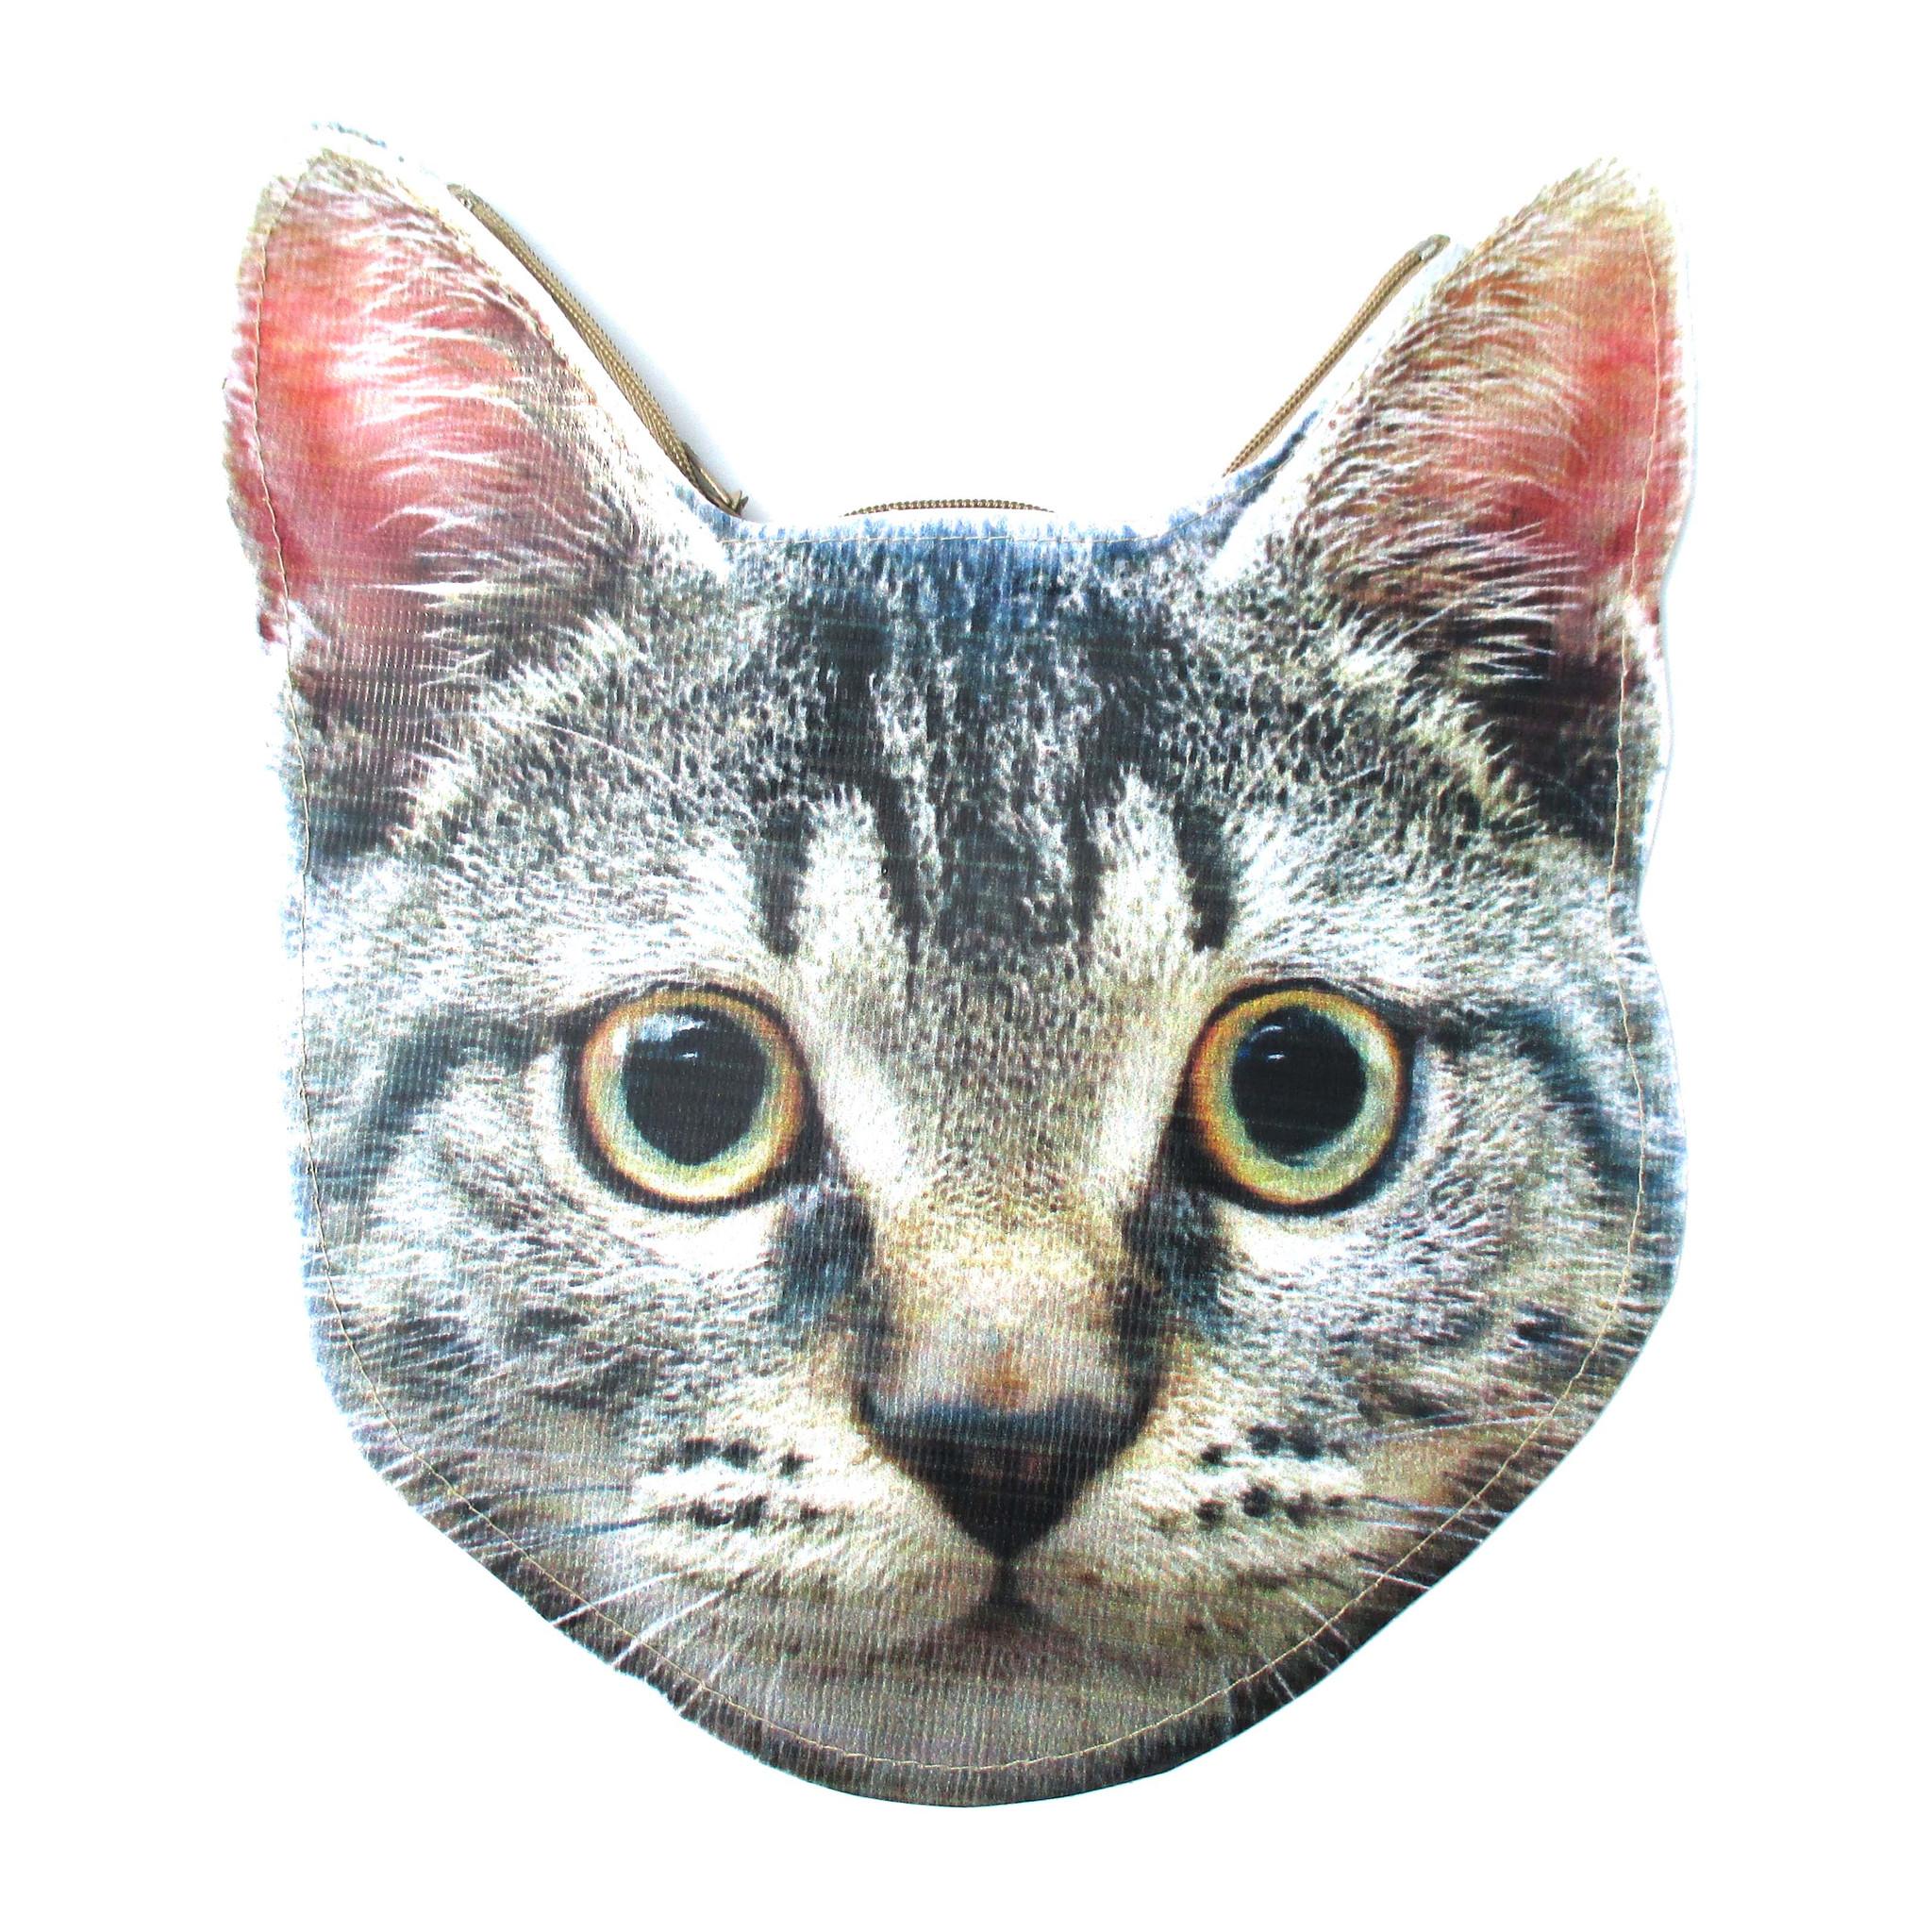 Grey Tabby Kitty Cat Head Shaped Vinyl Animal Photo Print Clutch Bag |  DOTOLY